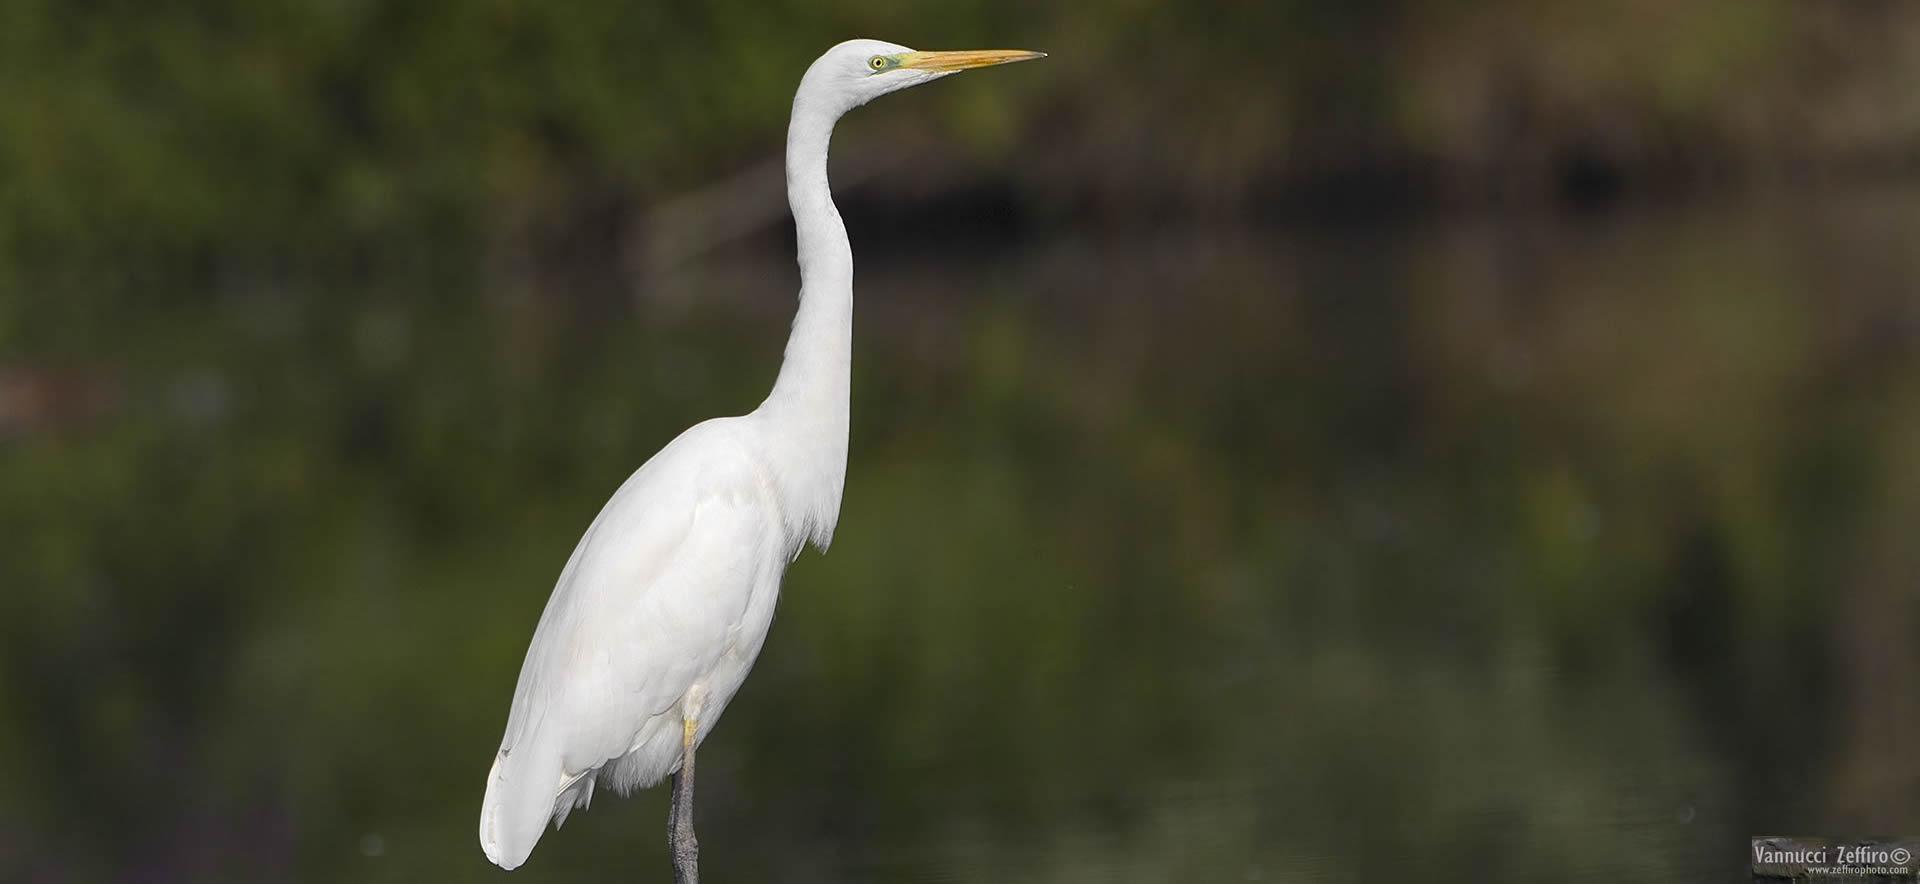 Ore 19:00 - Birdwatching nelle vasche di Maccarese